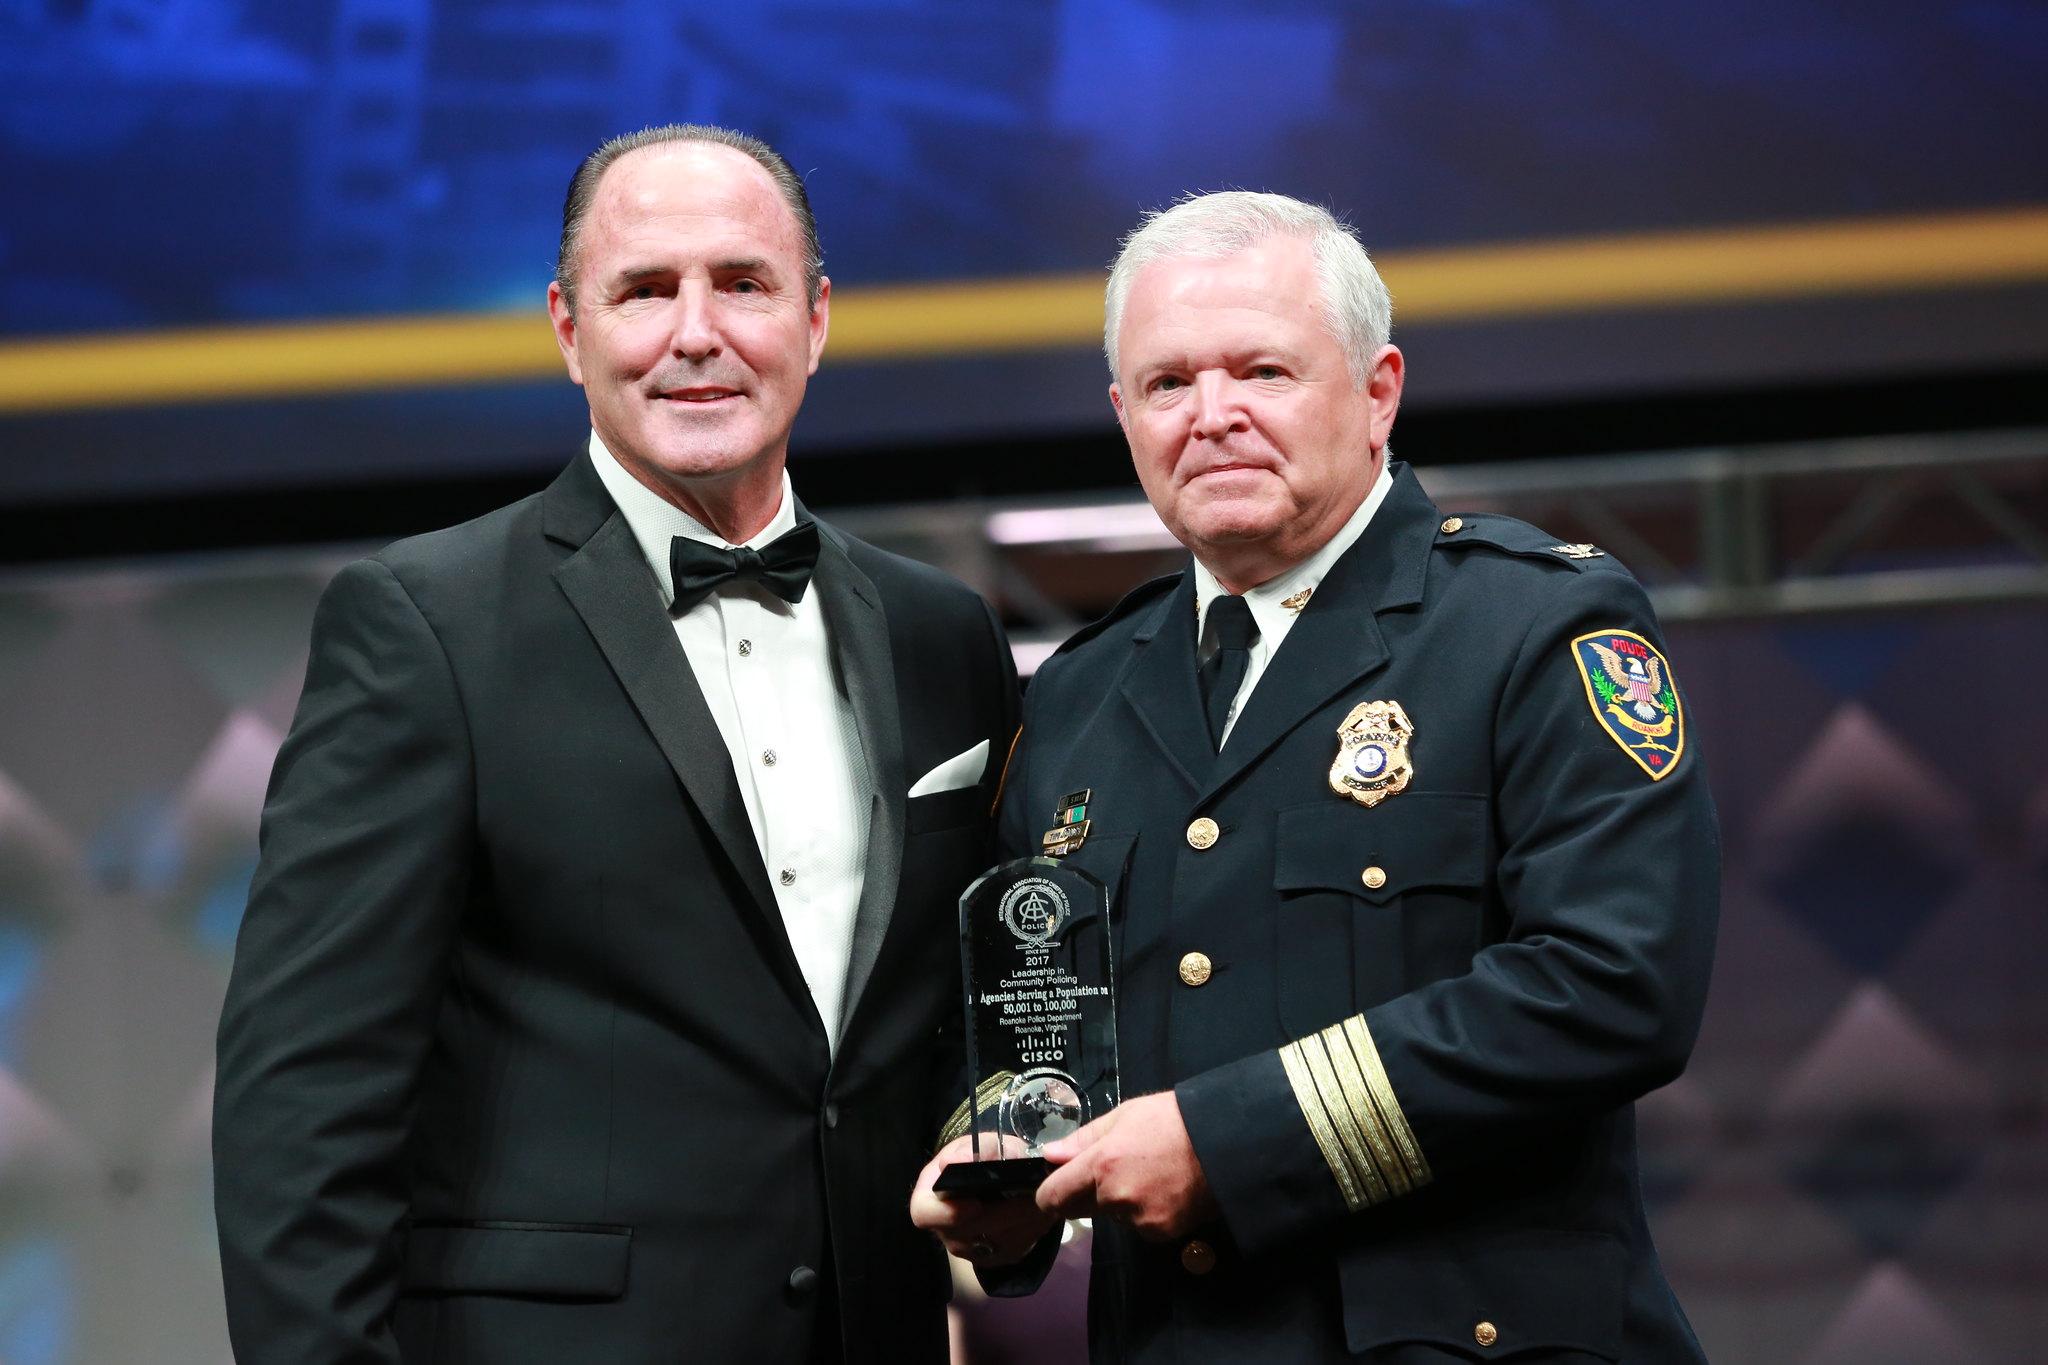 IACPCisco Leadership in Community Policing Award (50K-100K) - Roanoke